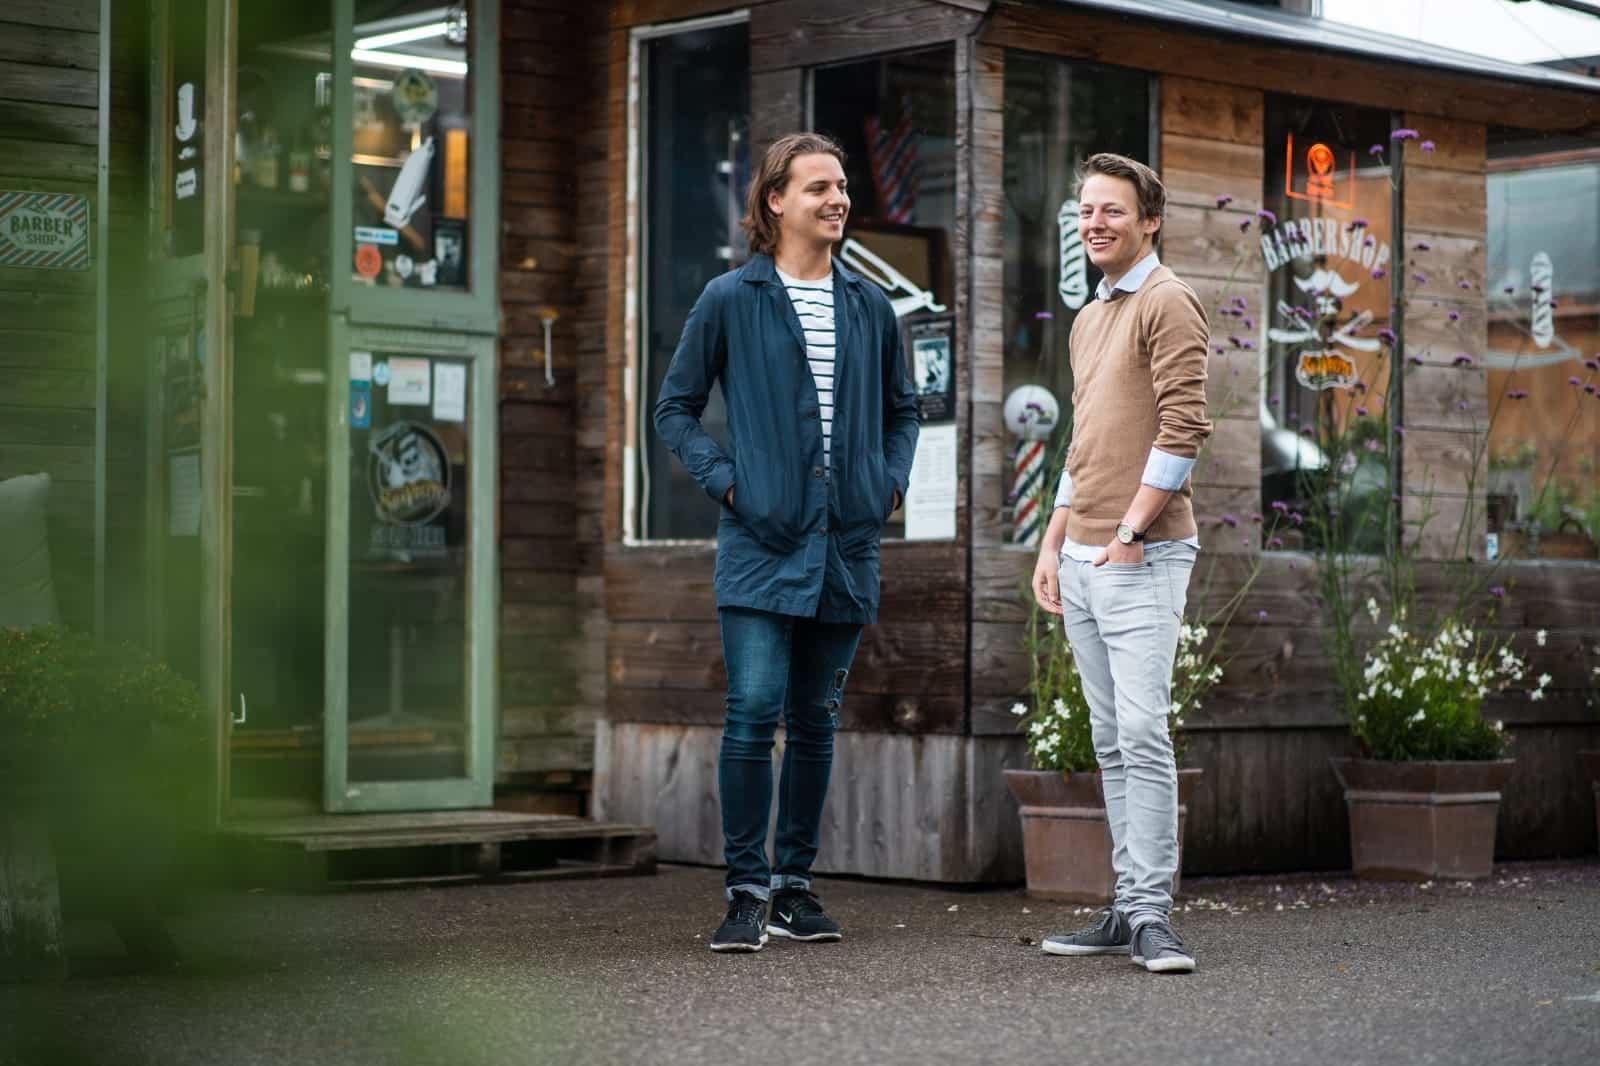 vacature sea marketeer - oprichters dennis & youri